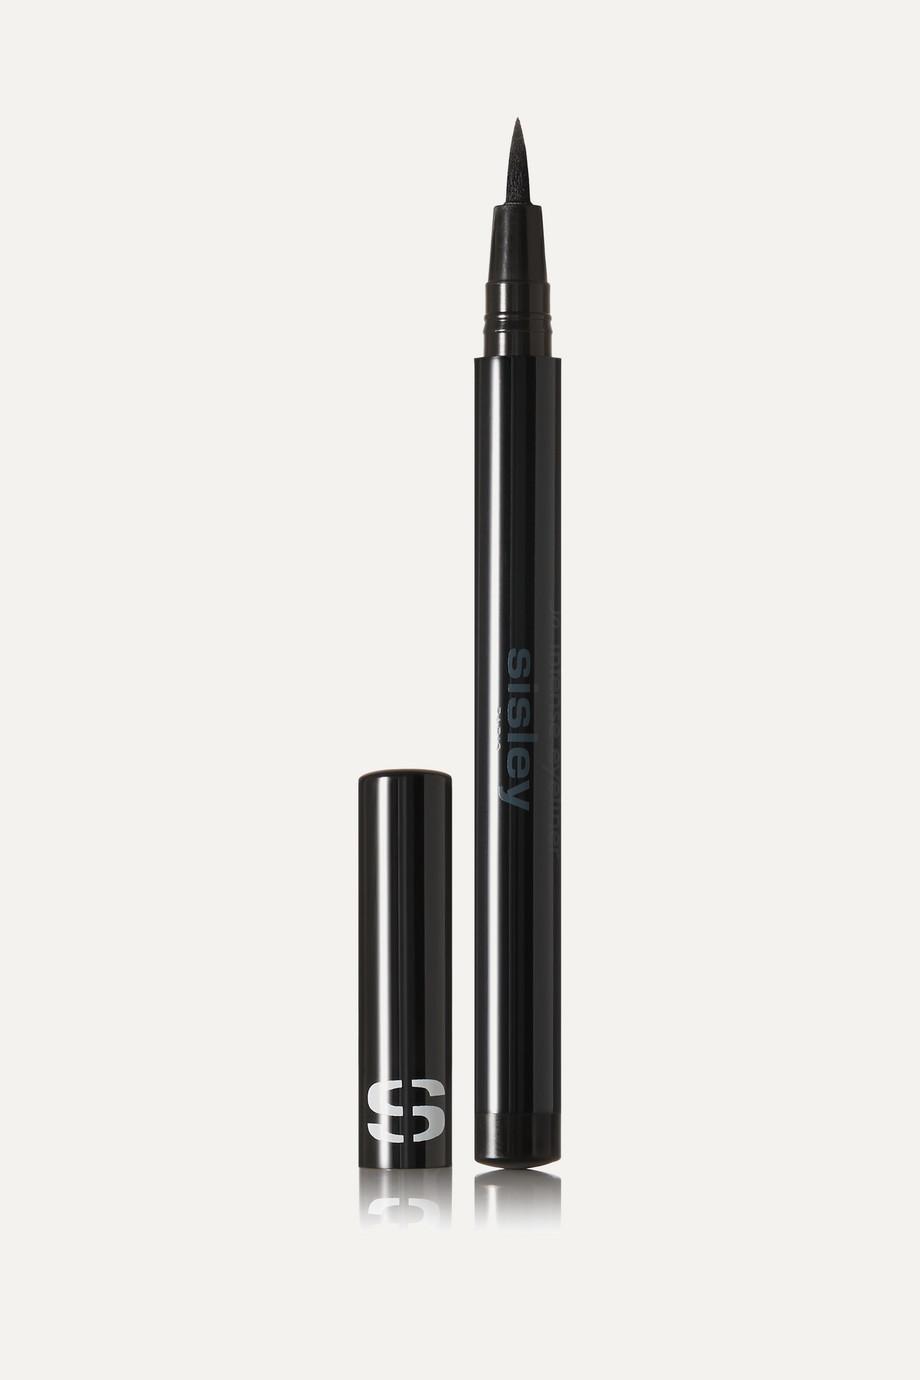 Sisley So Intense Eyeliner – 1 Black – Eyeliner